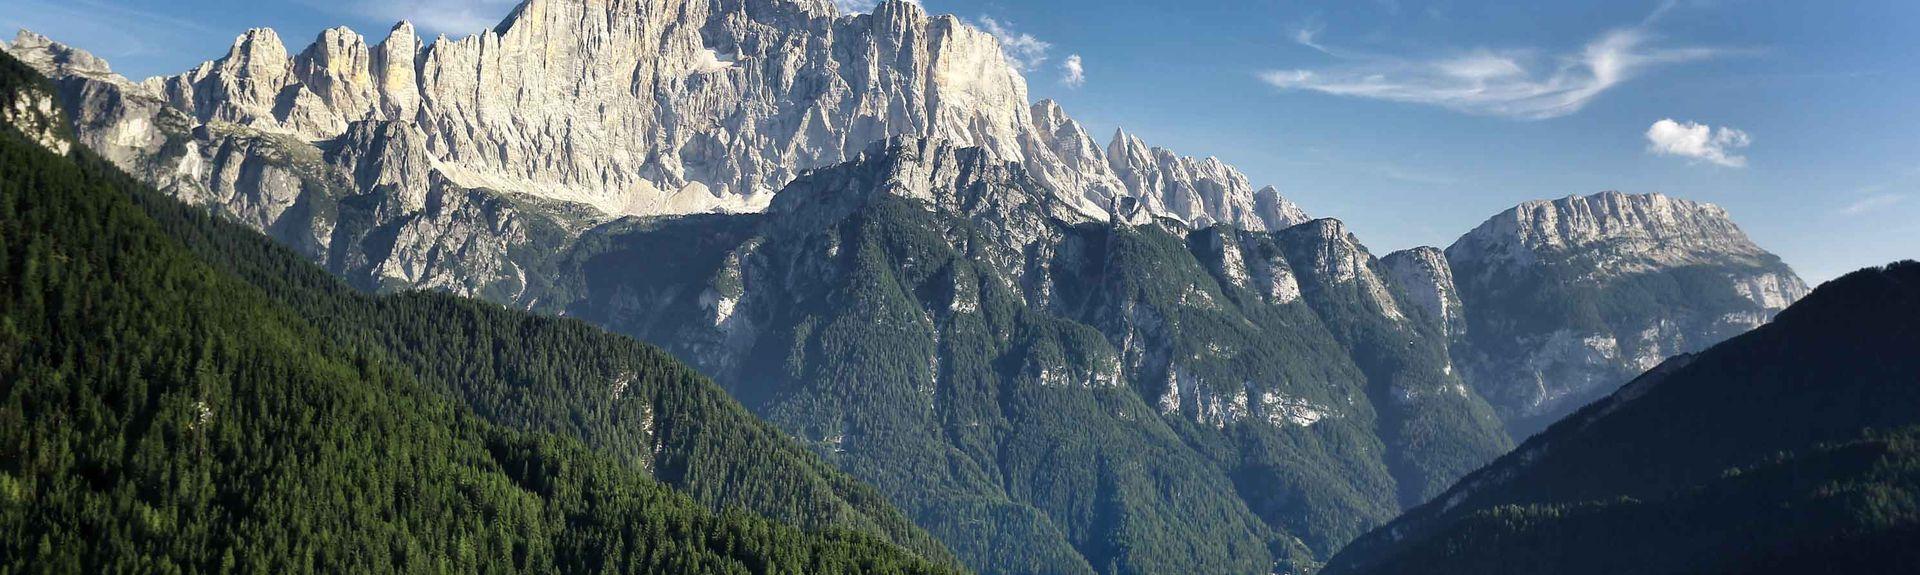 Chies, Belluno, Veneto, Italy